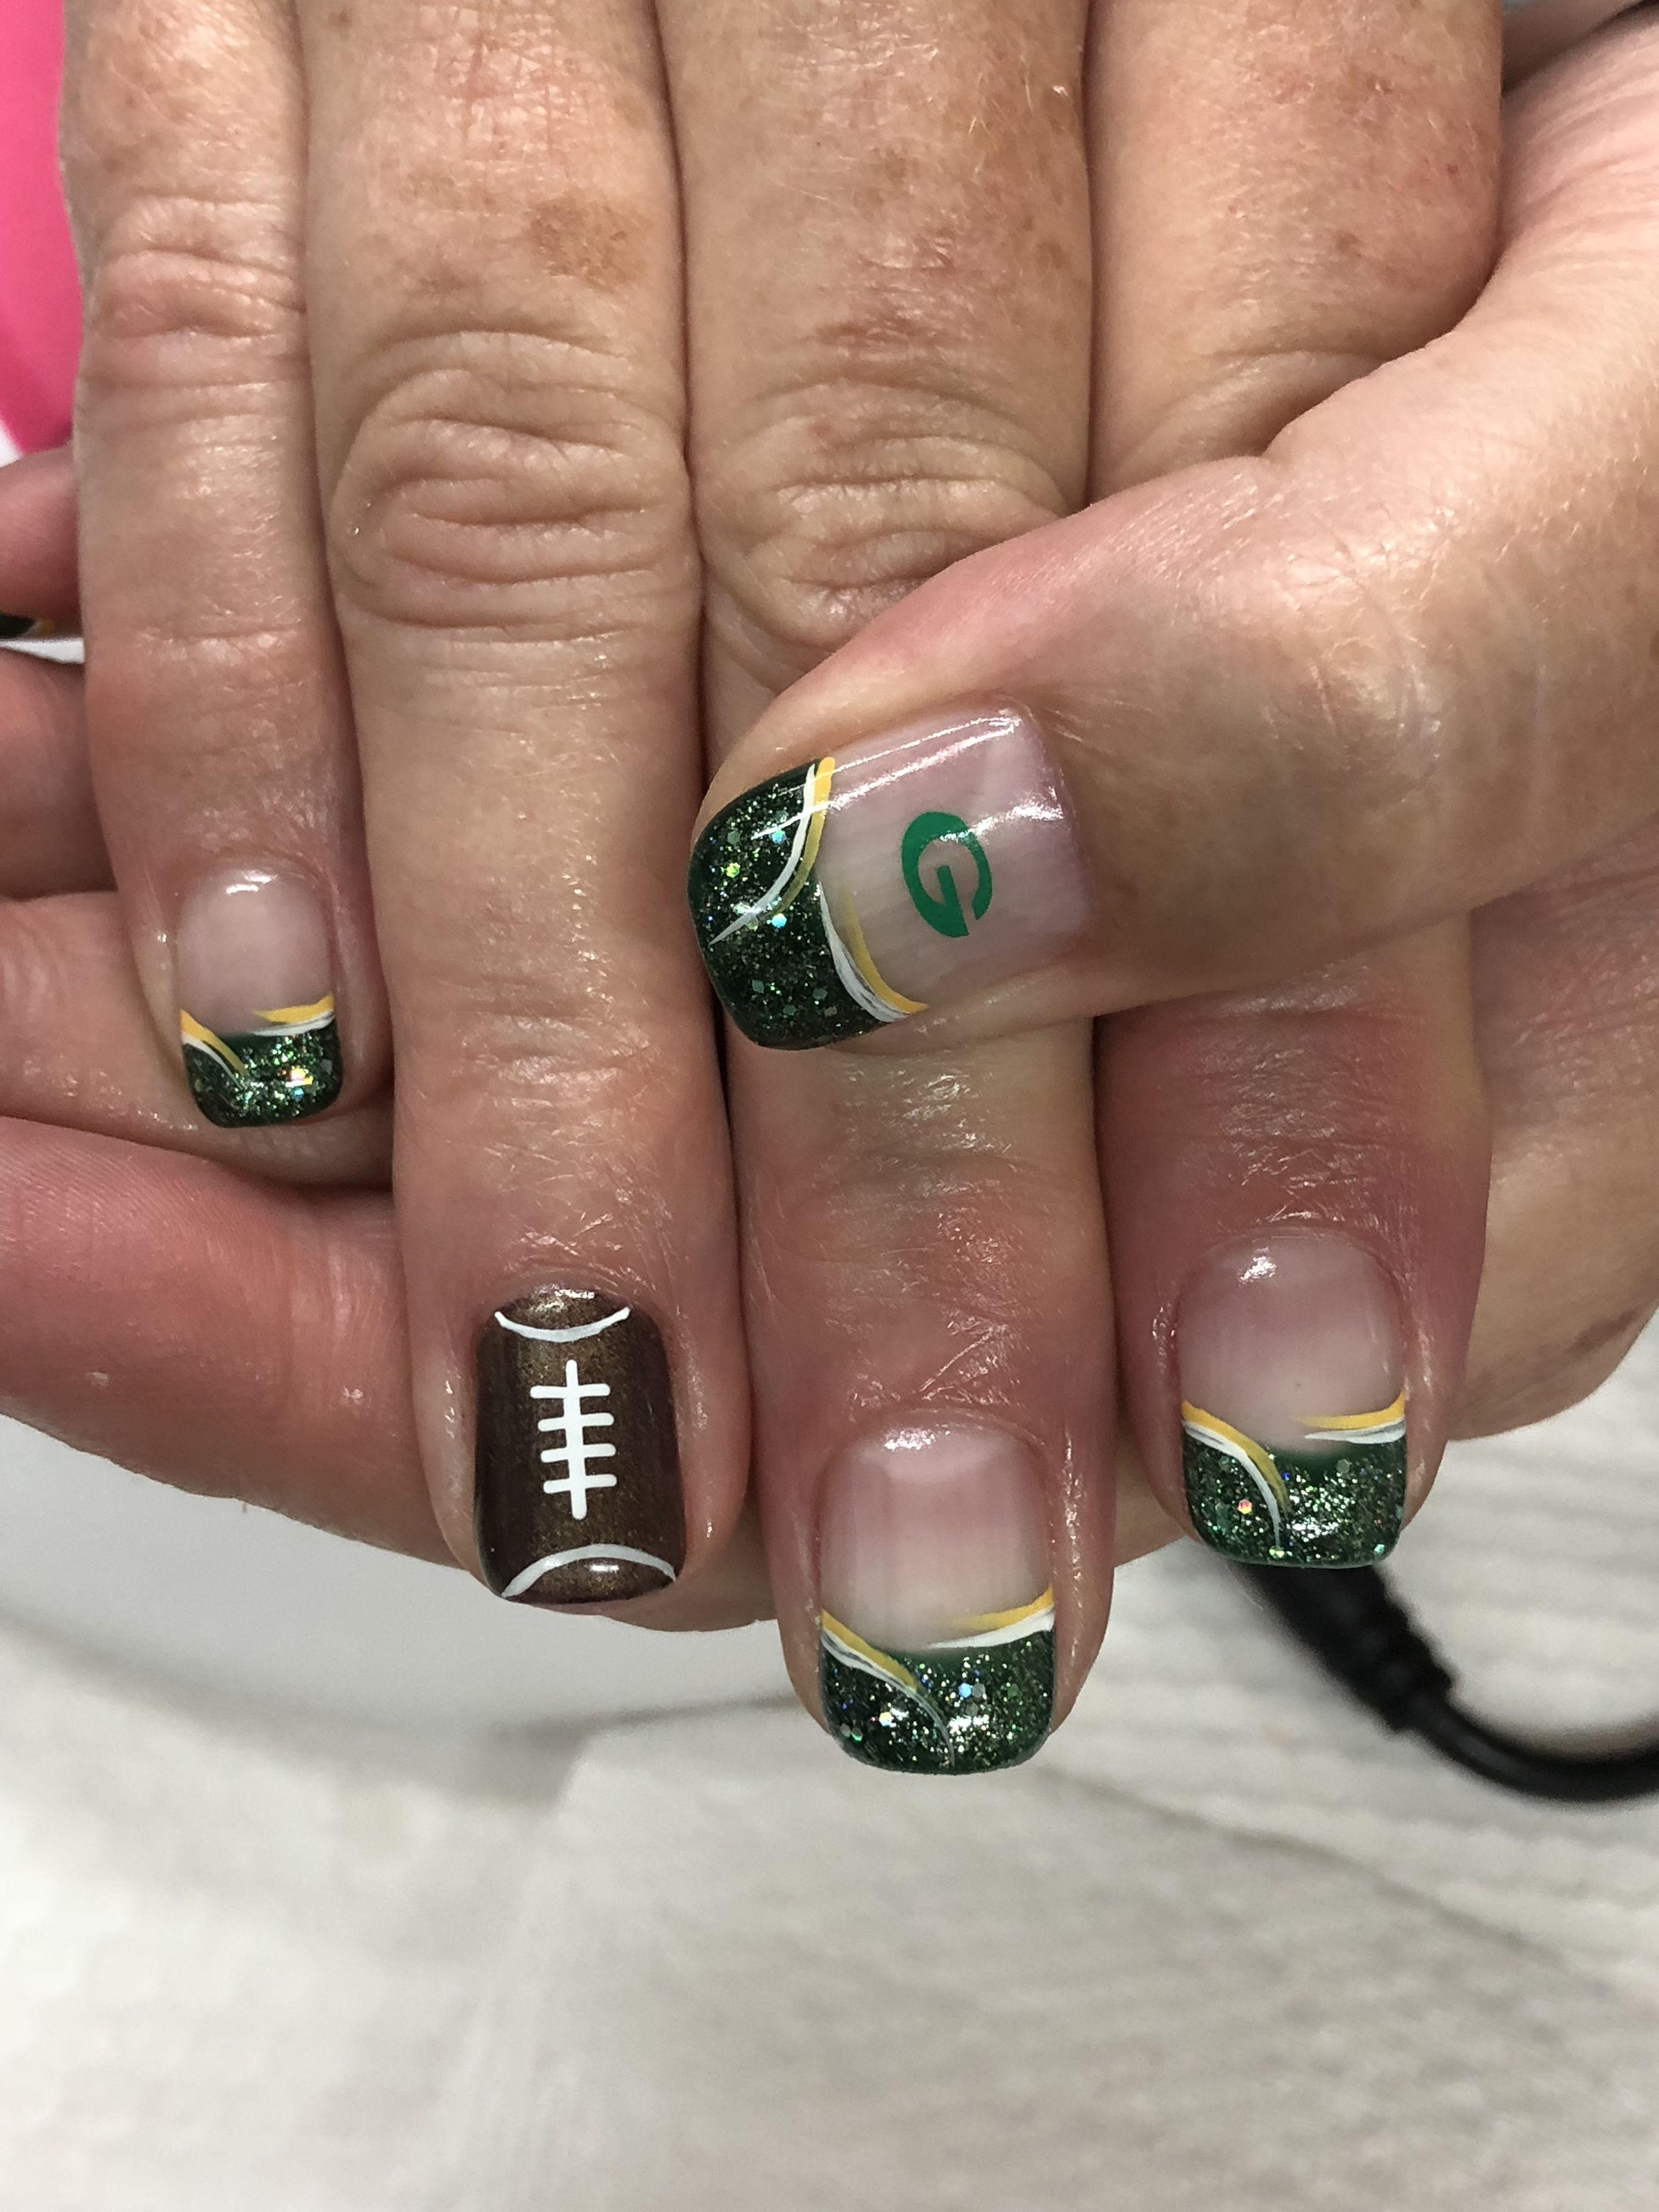 Green Bay Packer Gel Nails Green Bay Packers Nail Art Green Bay Packers Nails Football Nails